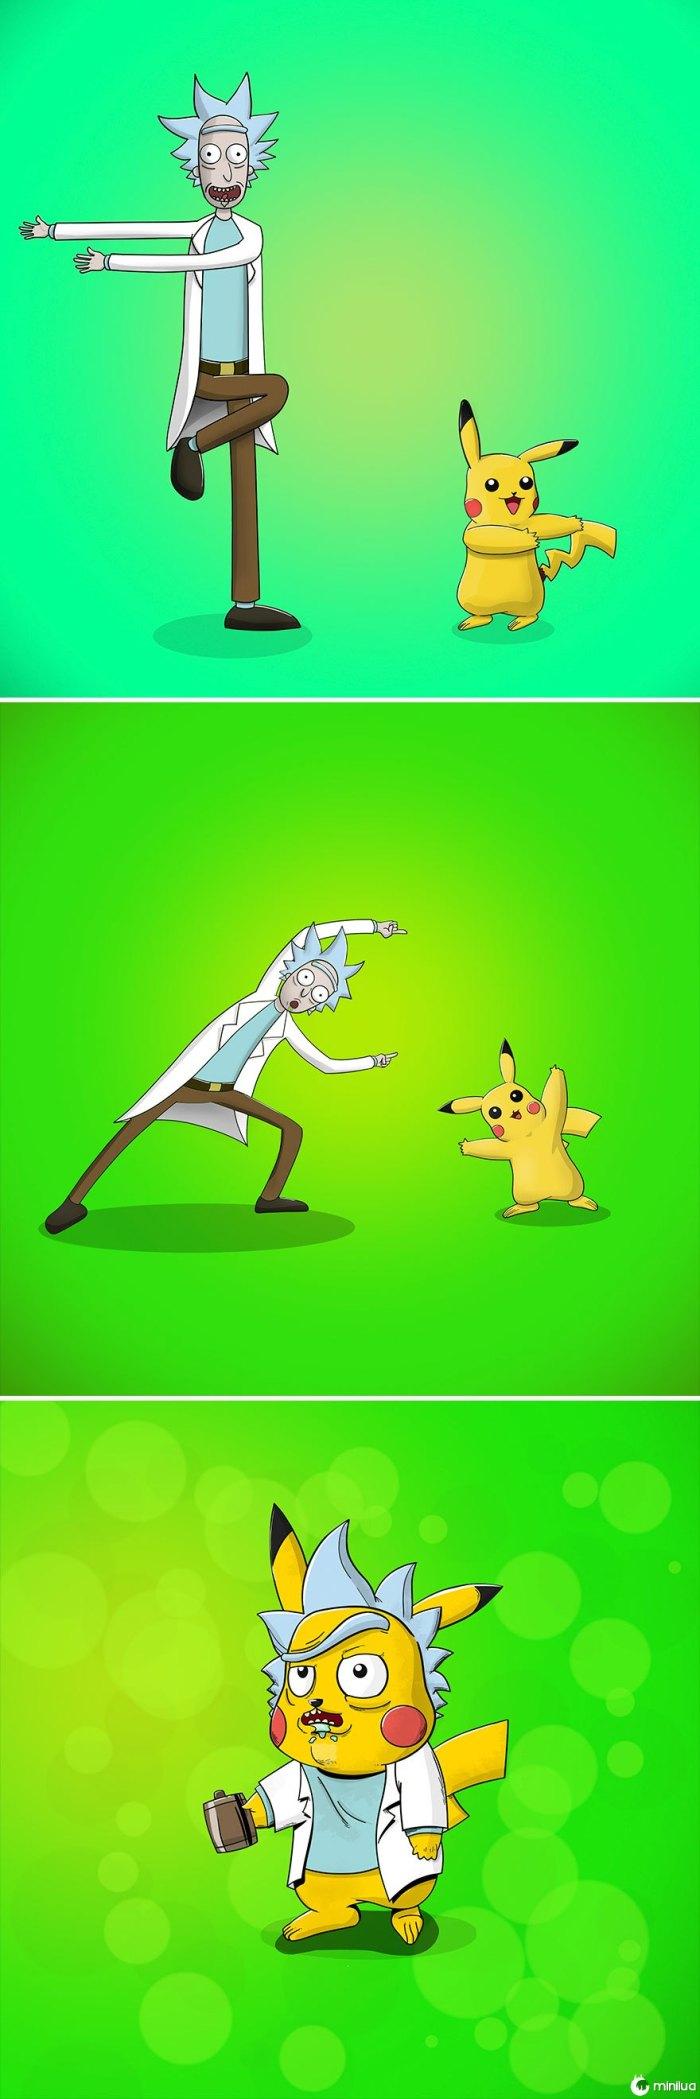 Rick + Pikachu